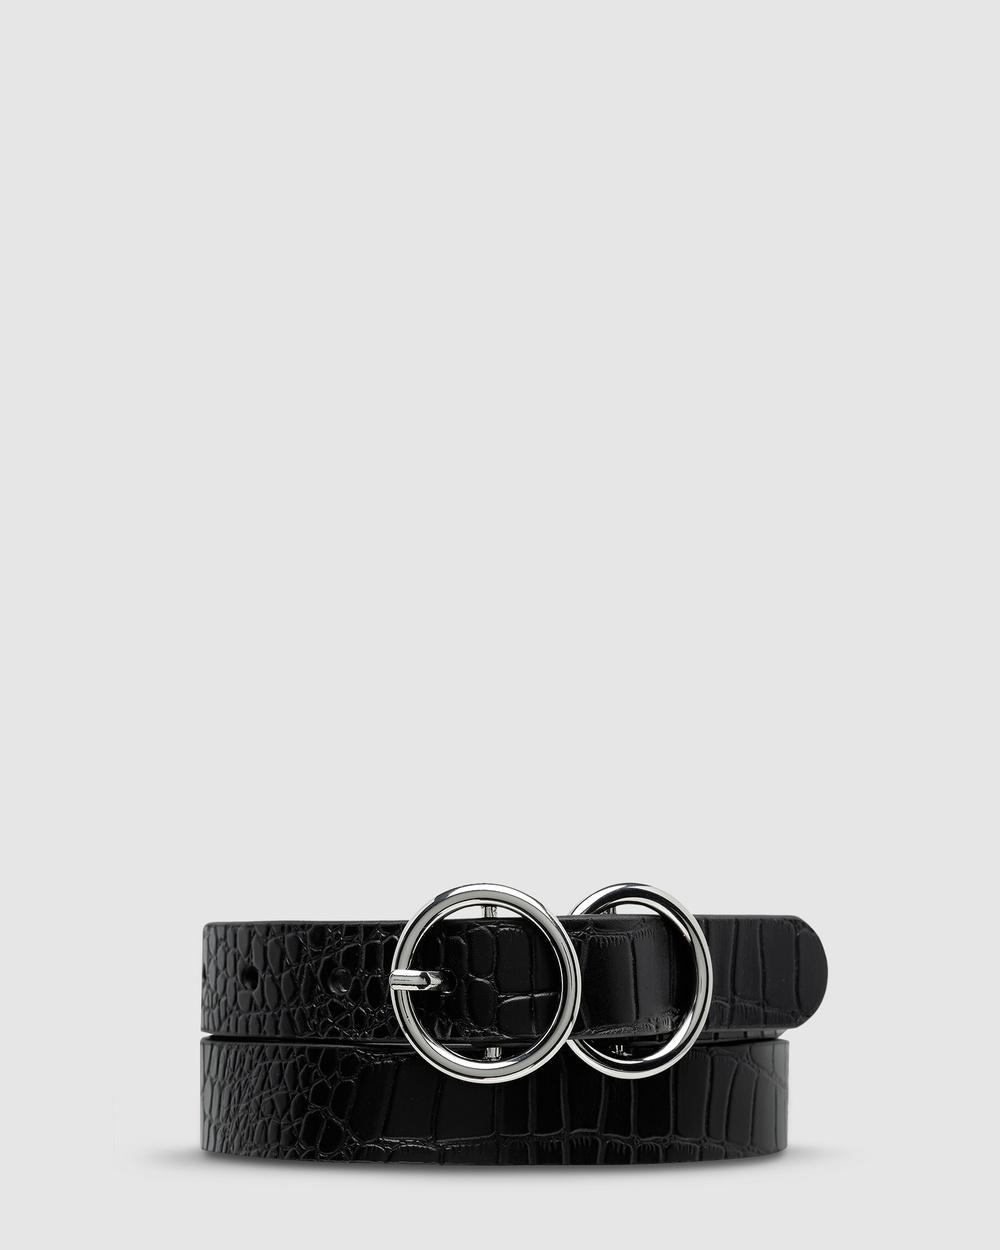 Status Anxiety Mislaid Skinny Belt Belts Black Croc/Silver